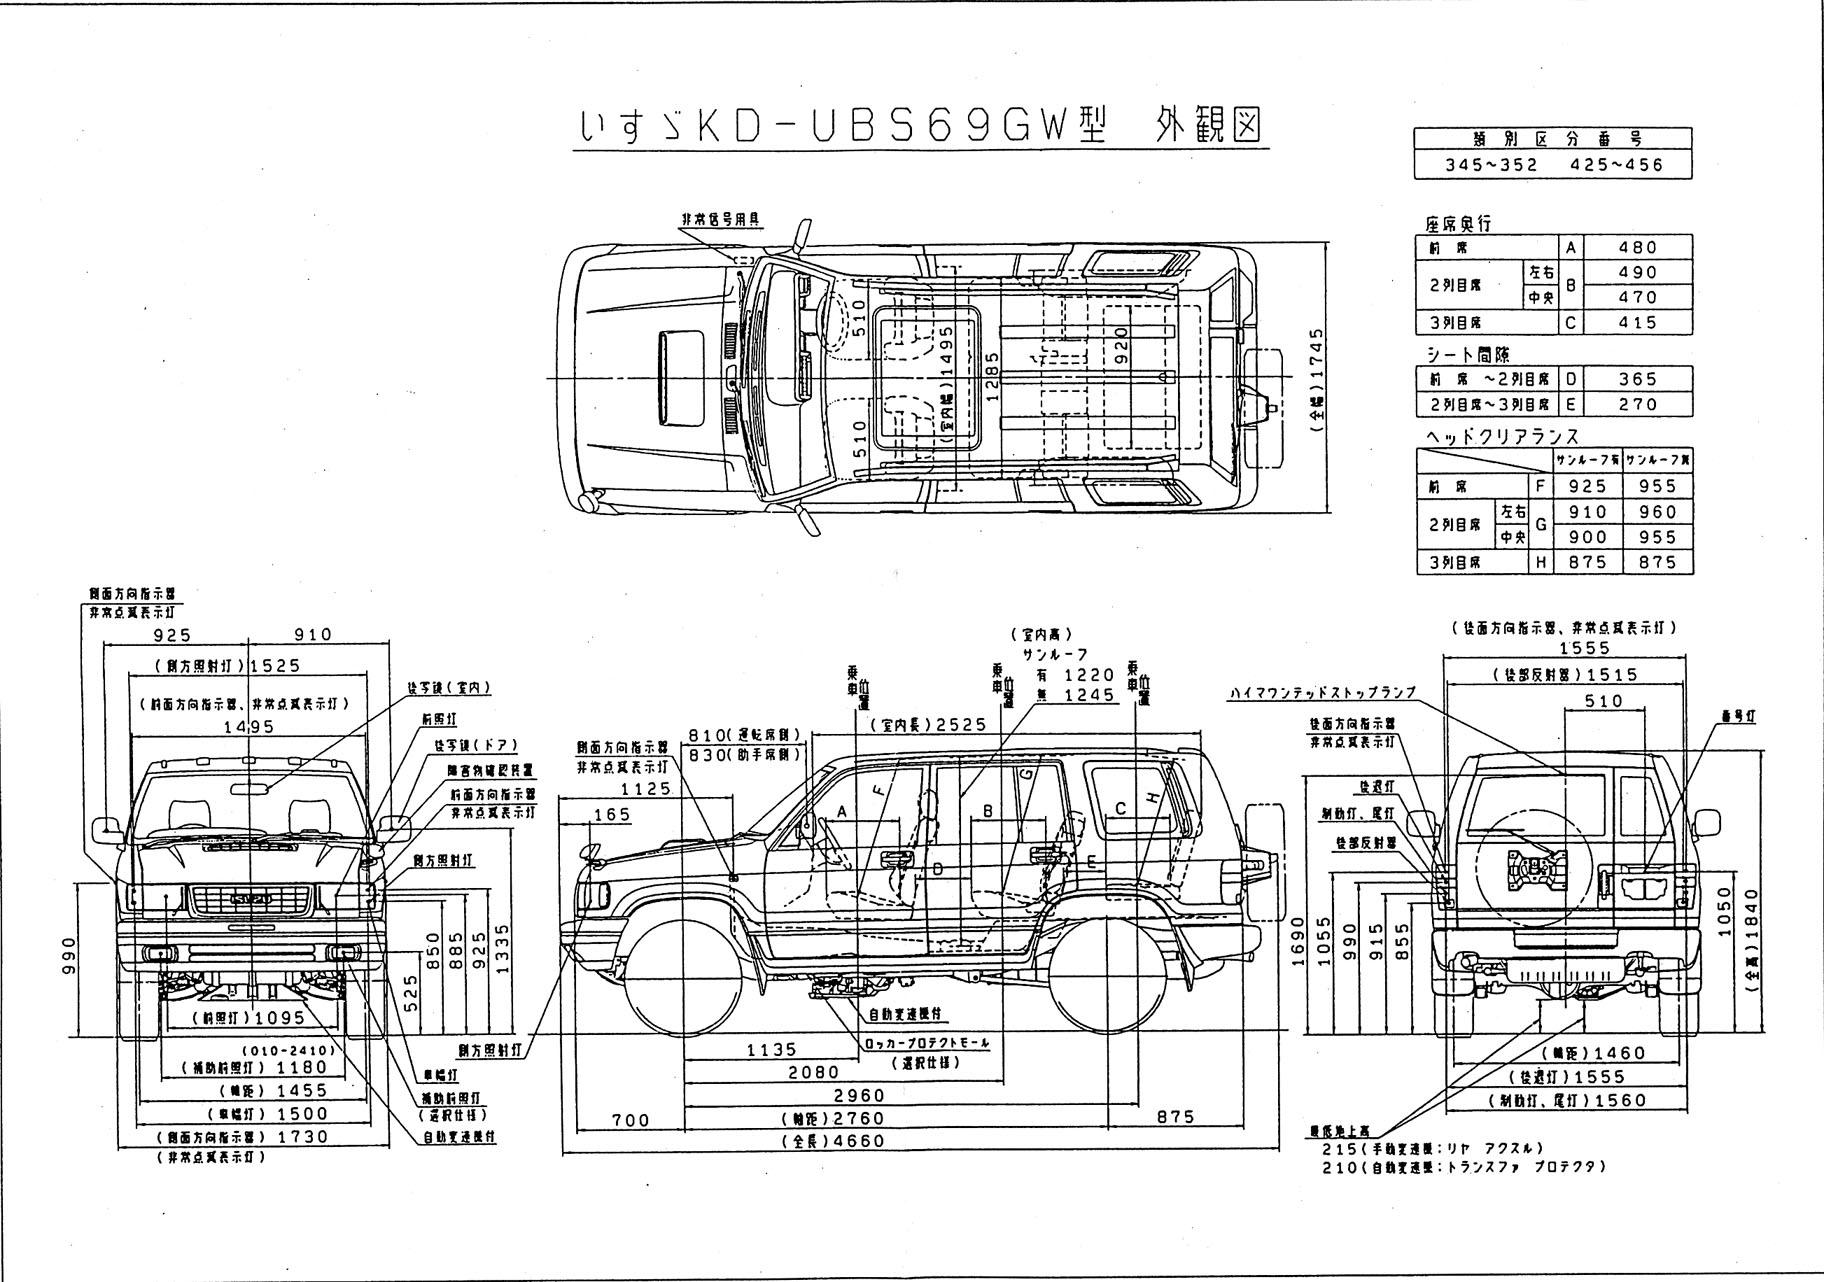 Big Horn Isuzu Tod Wiring Diagram Library 1990 Truck Trooper Japan Accessories Catalog